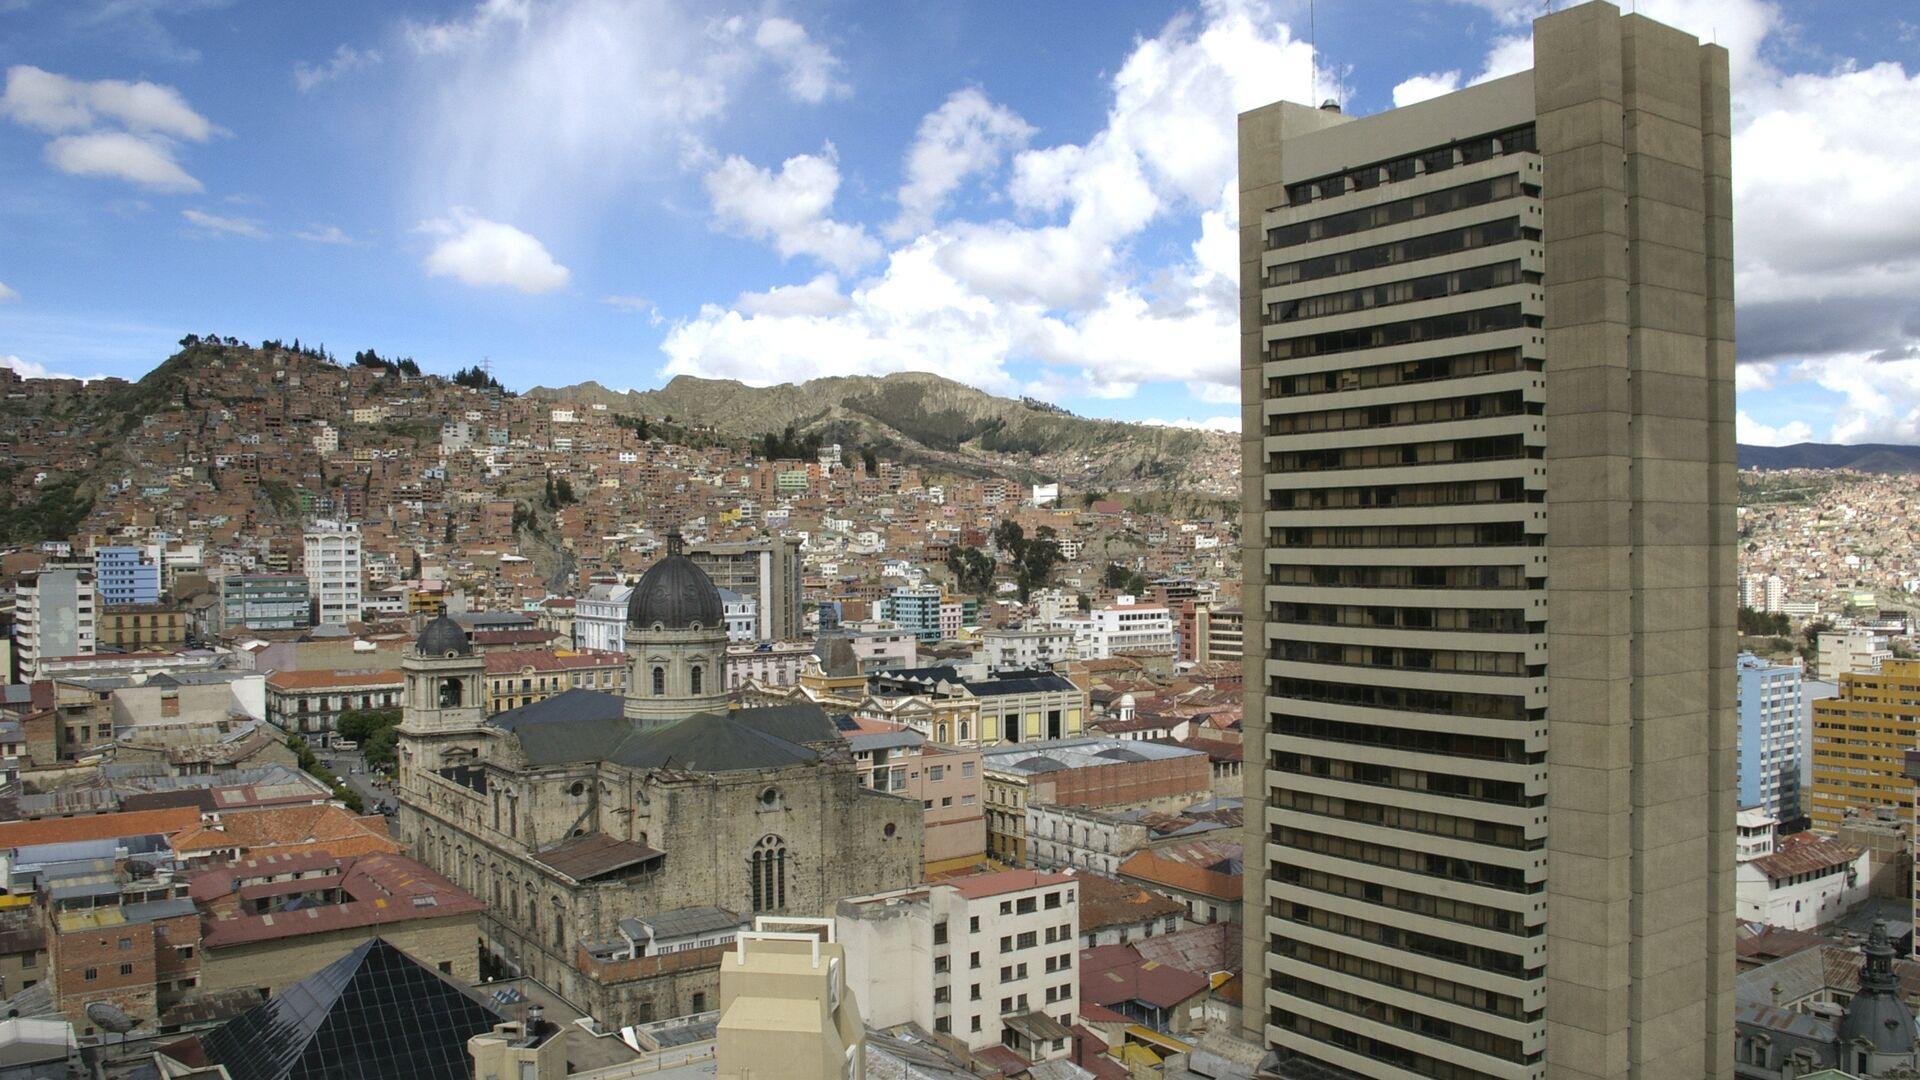 La Paz, la capital de Bolivia - Sputnik Mundo, 1920, 28.07.2021